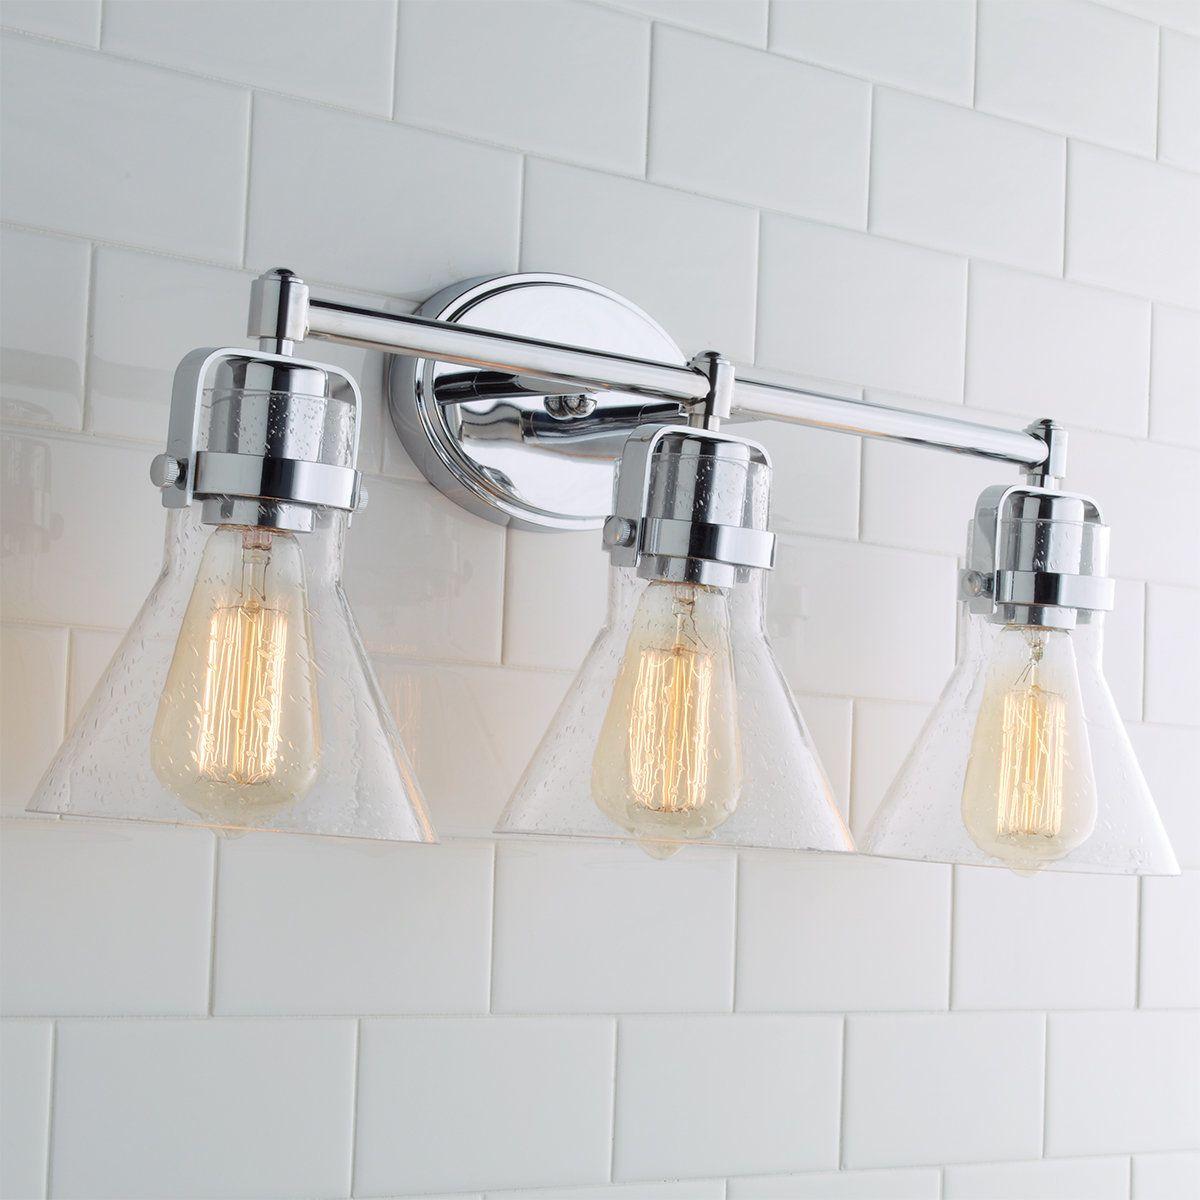 Bubble Art Glass Vanity Light Led Bathroom Vanity Lights Bath Light Fixtures Bathroom Light Fixtures